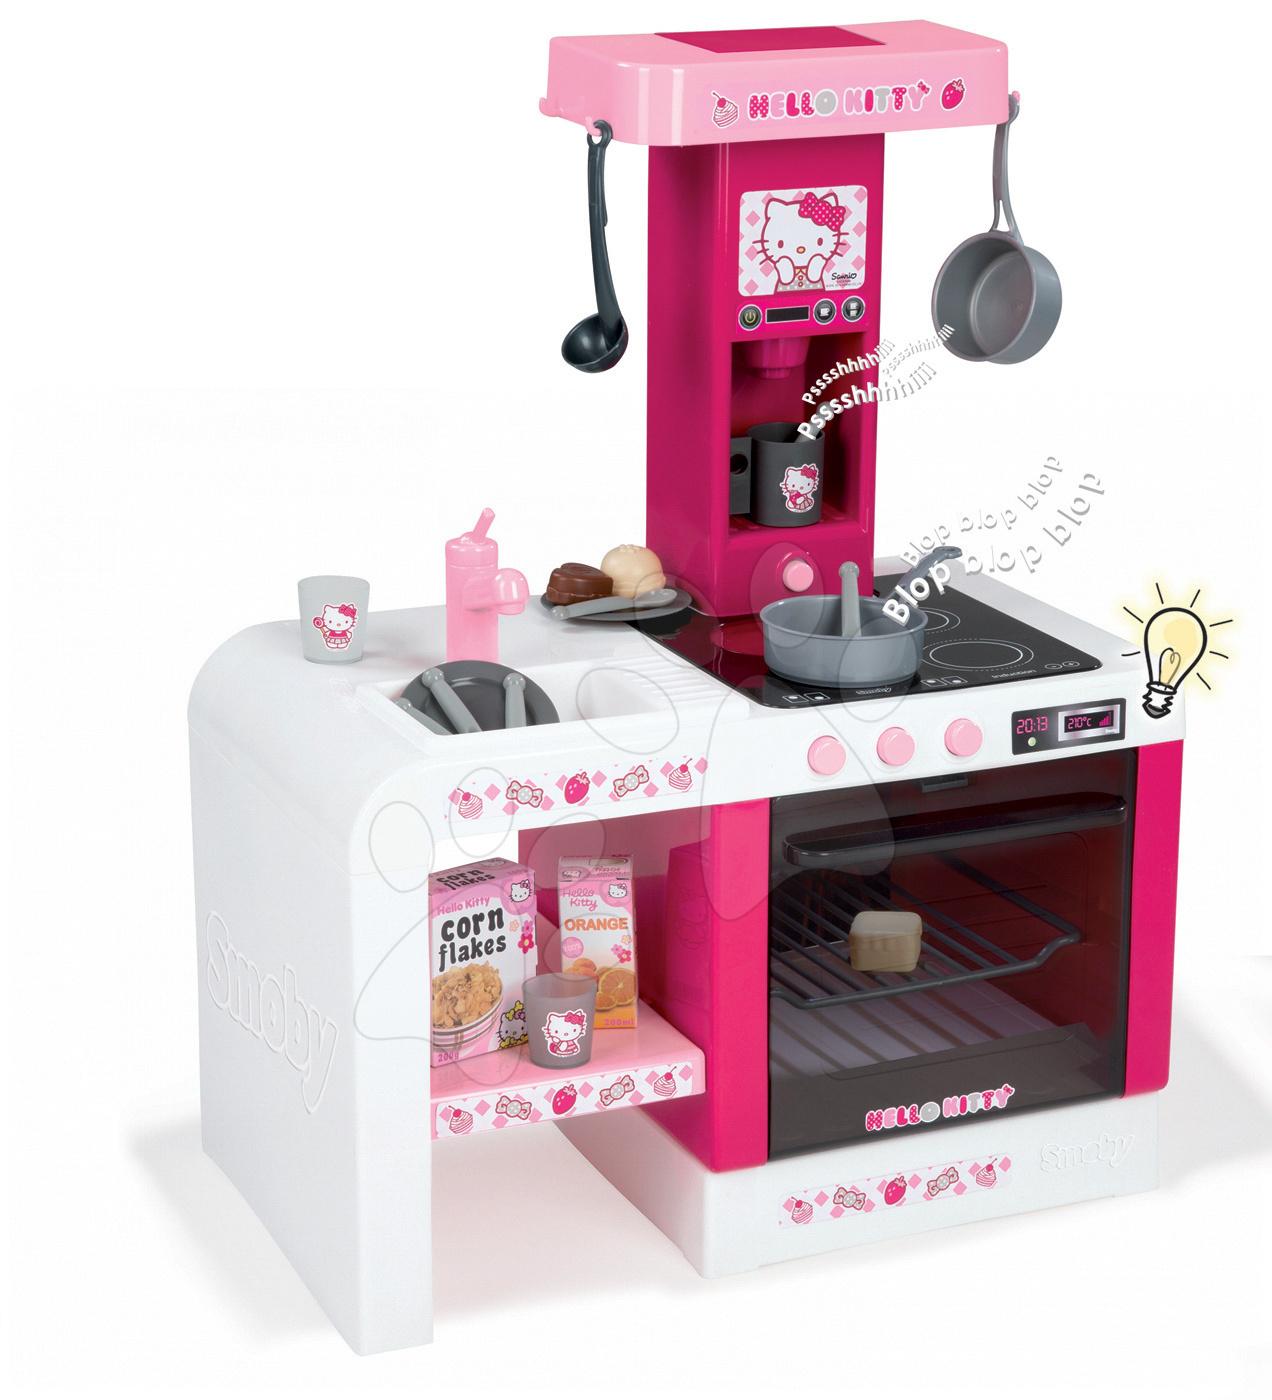 Kuhinja Hello Kitty Cheftronic Smoby elektronska z zvoki, lučmi in 19 dodatki temnorožnata